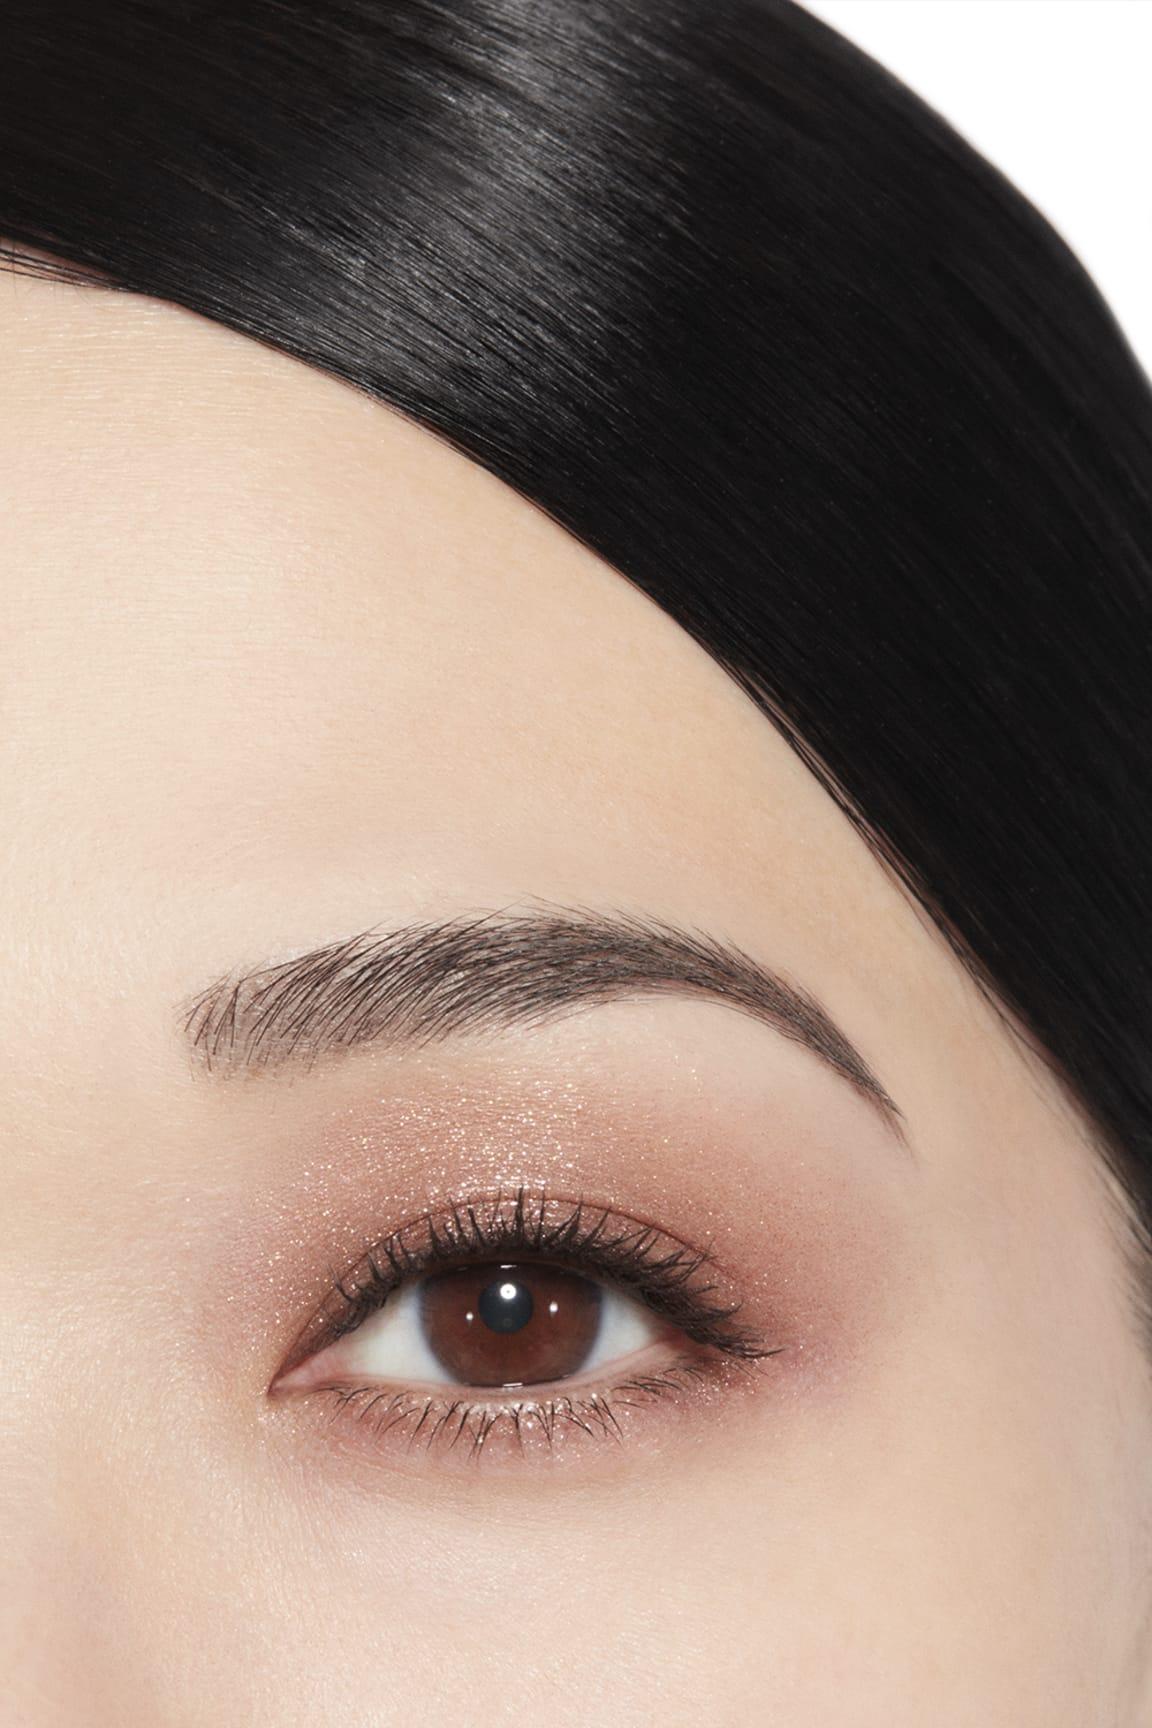 Application makeup visual 1 - ILLUSION D'OMBRE 97 - NEW MOON